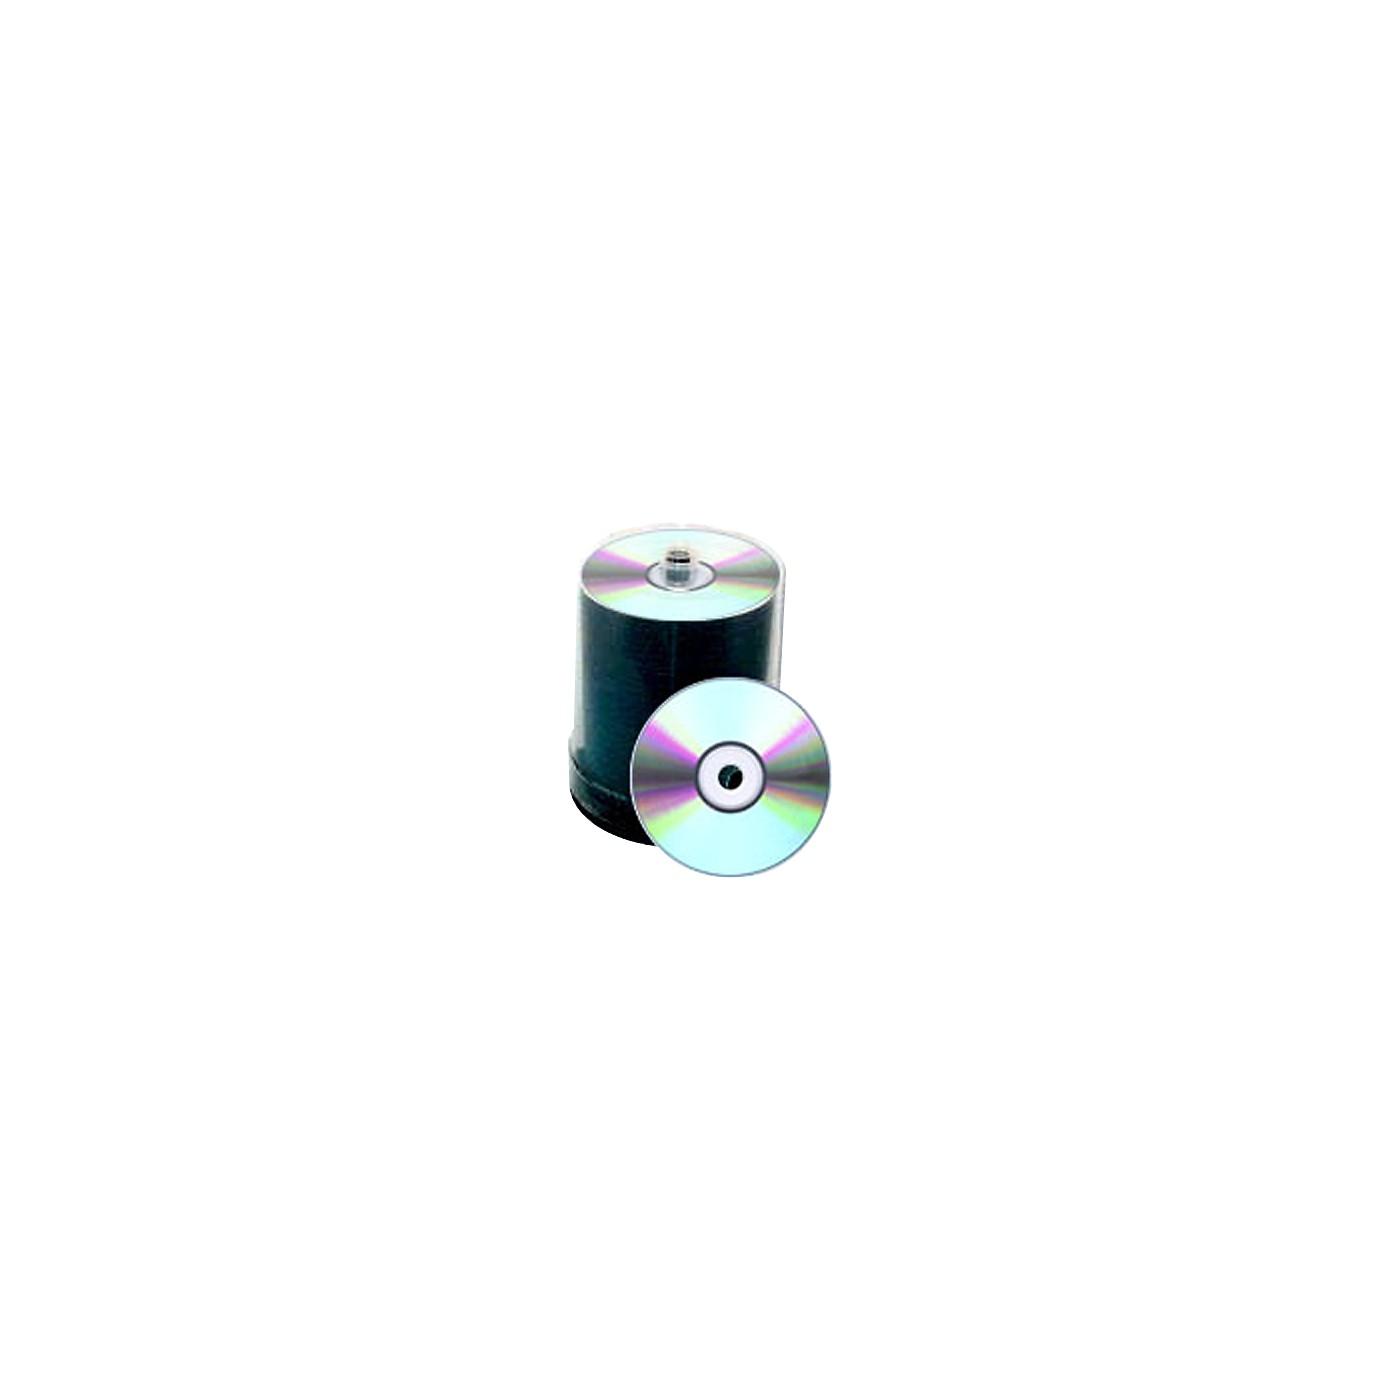 Taiyo Yuden 4.7GB DVD+R, 8X, Silver Thermal Laquer, 100 Discs thumbnail